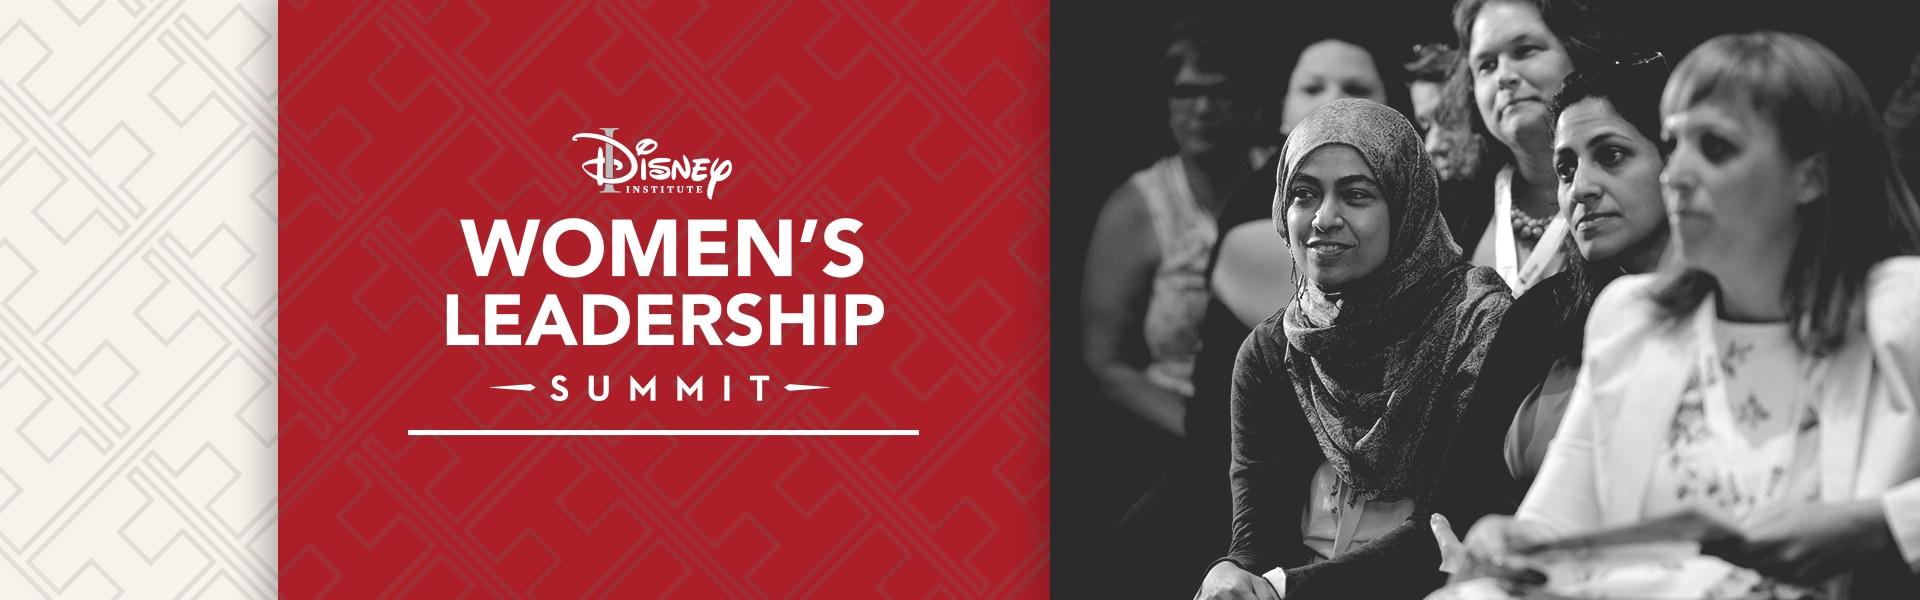 Women's Leadership Summit at Disney World Resort | Disney Institute